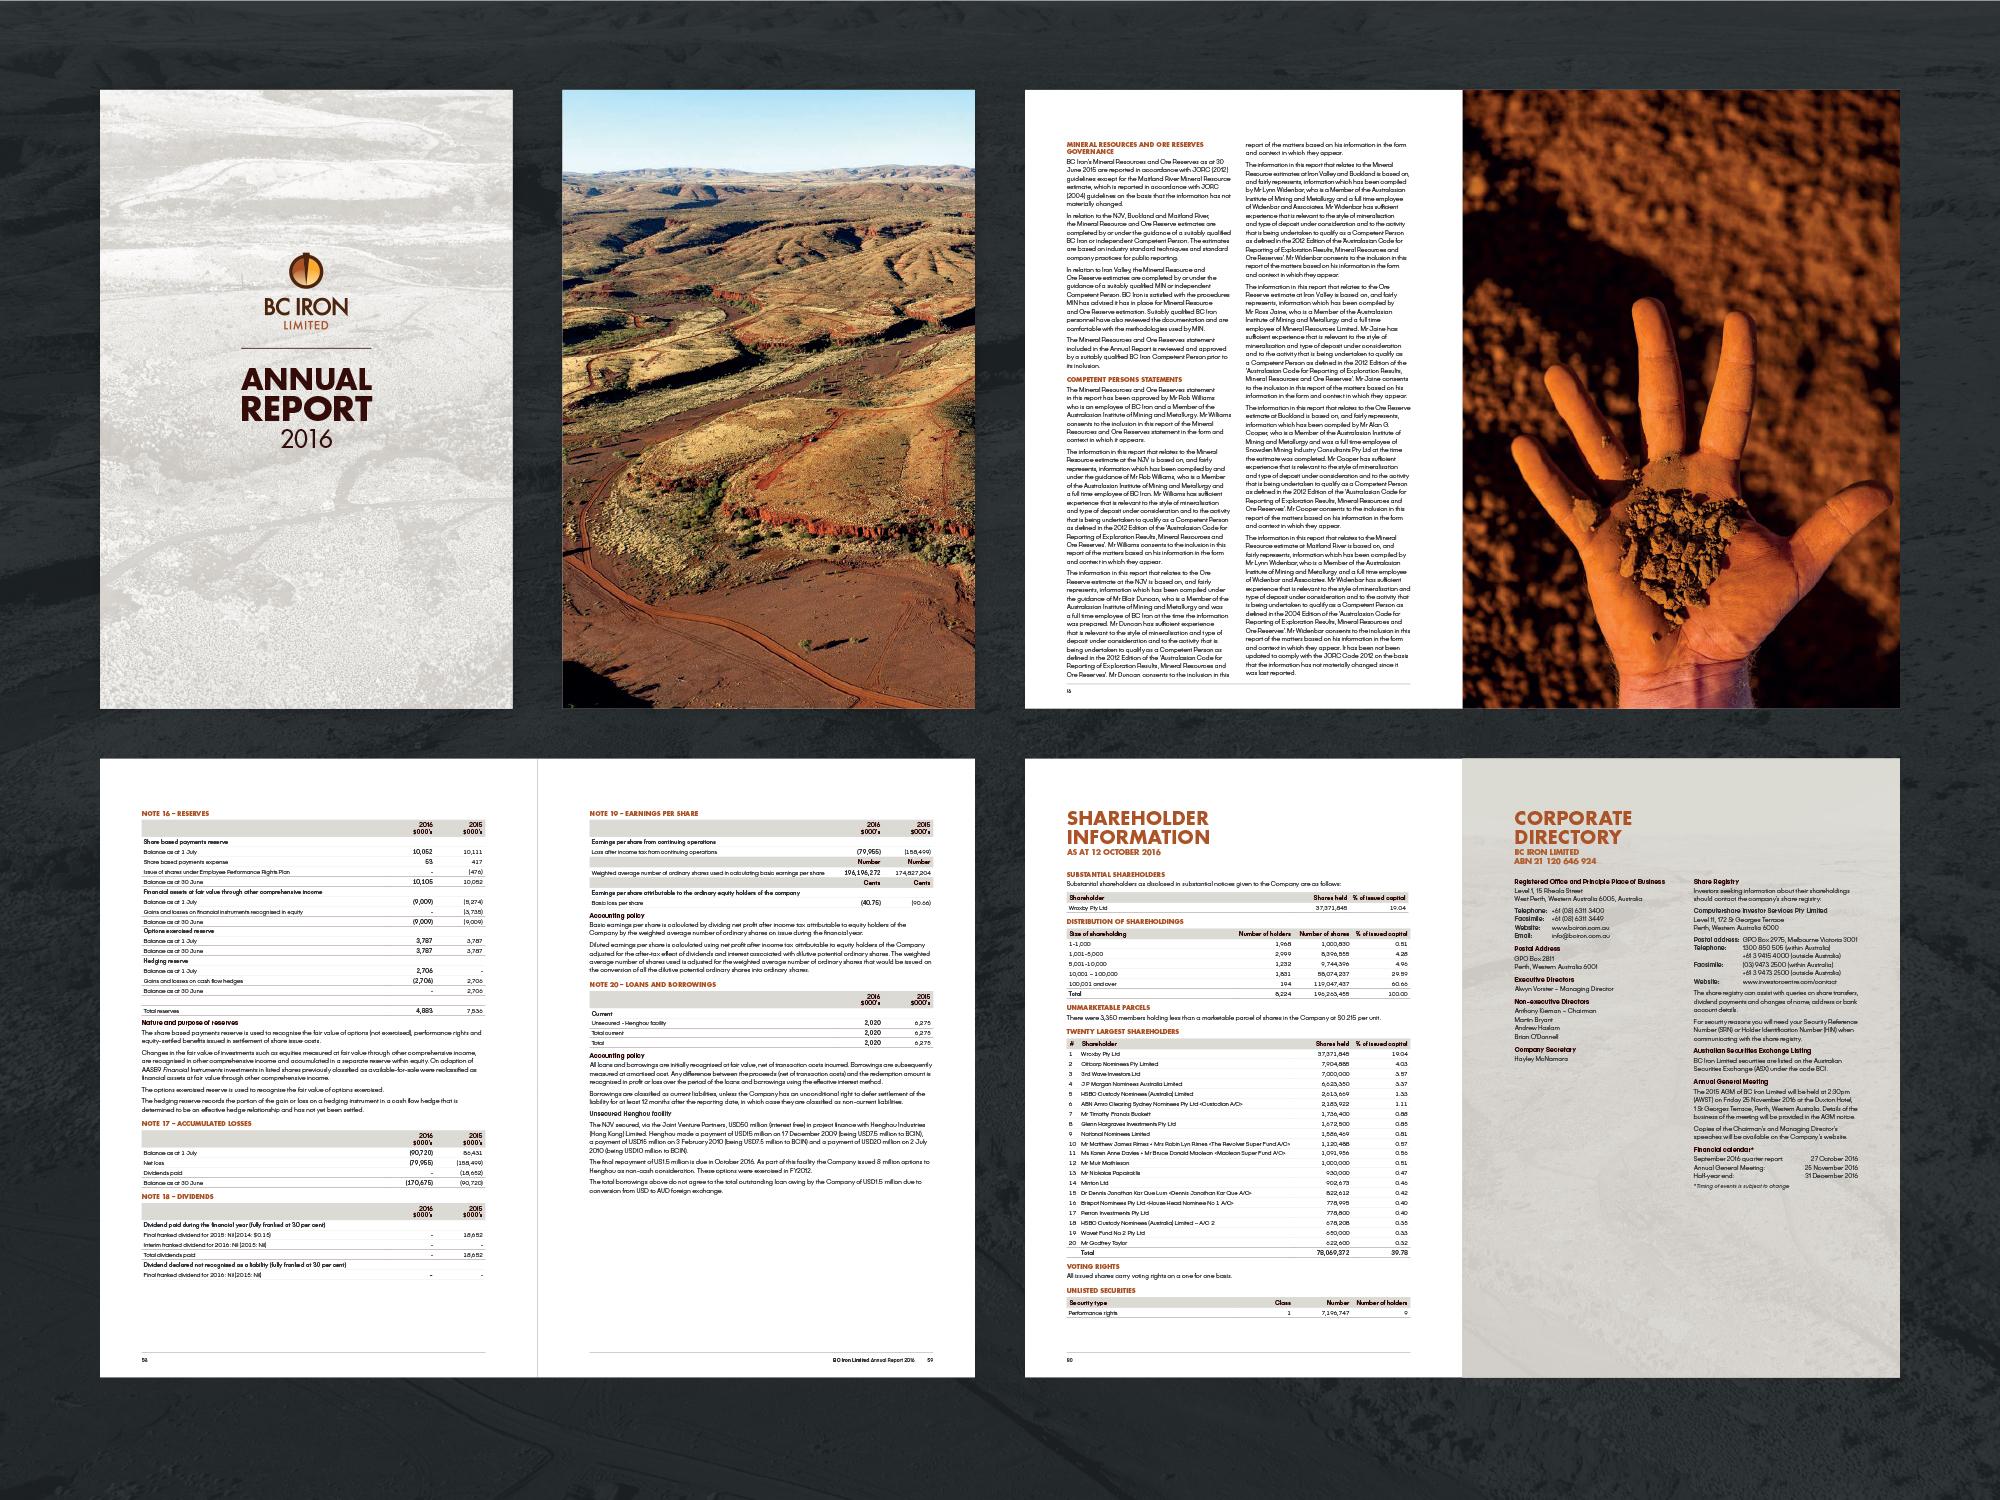 BC Iron Annual Report